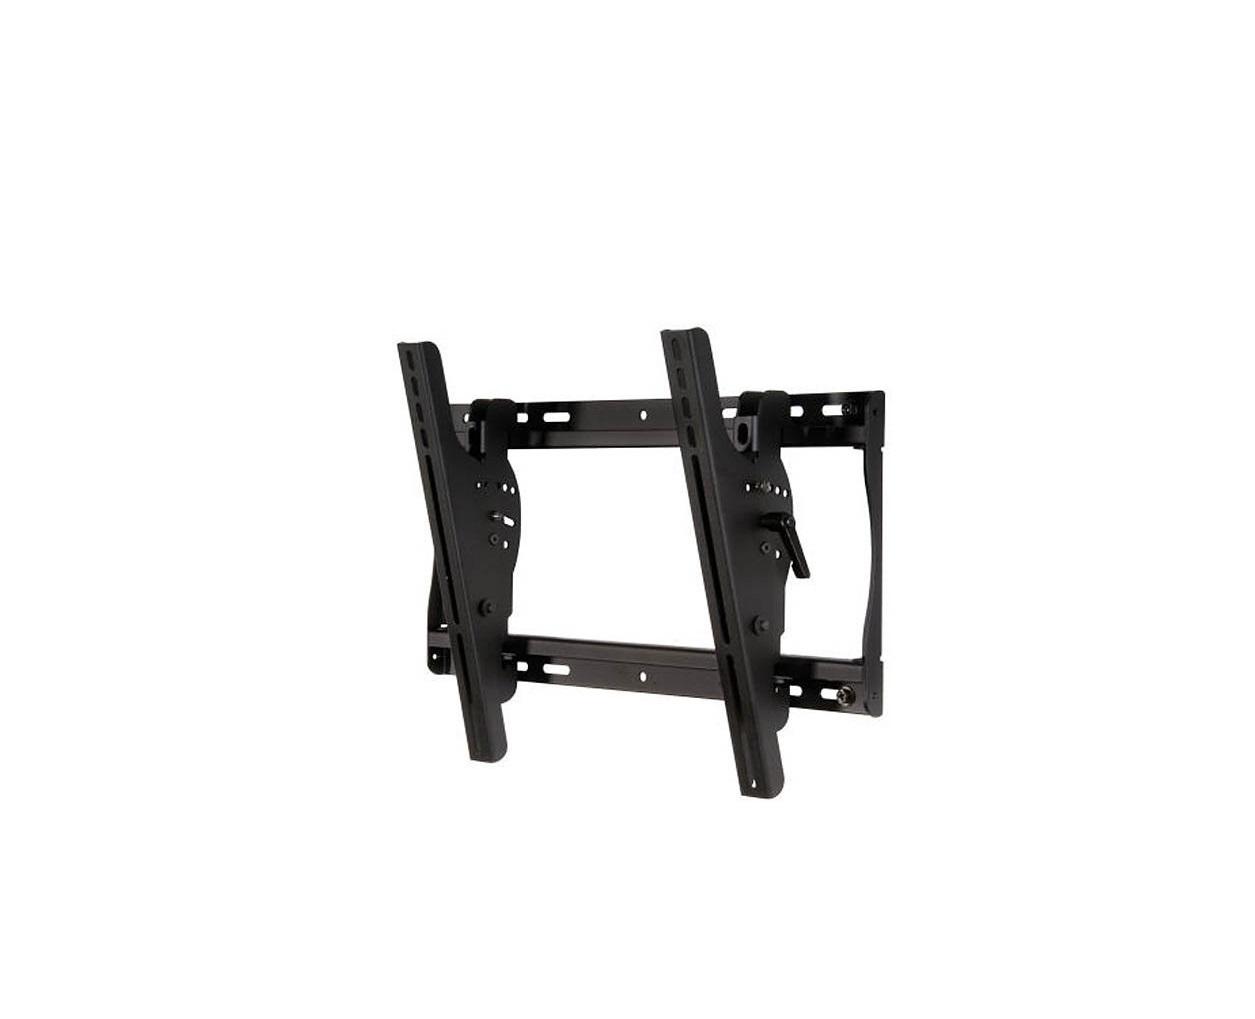 Peerless SmartMount Universal Tilt Wall Mount For 23-46 Flat Panel Displays (Black) ST640